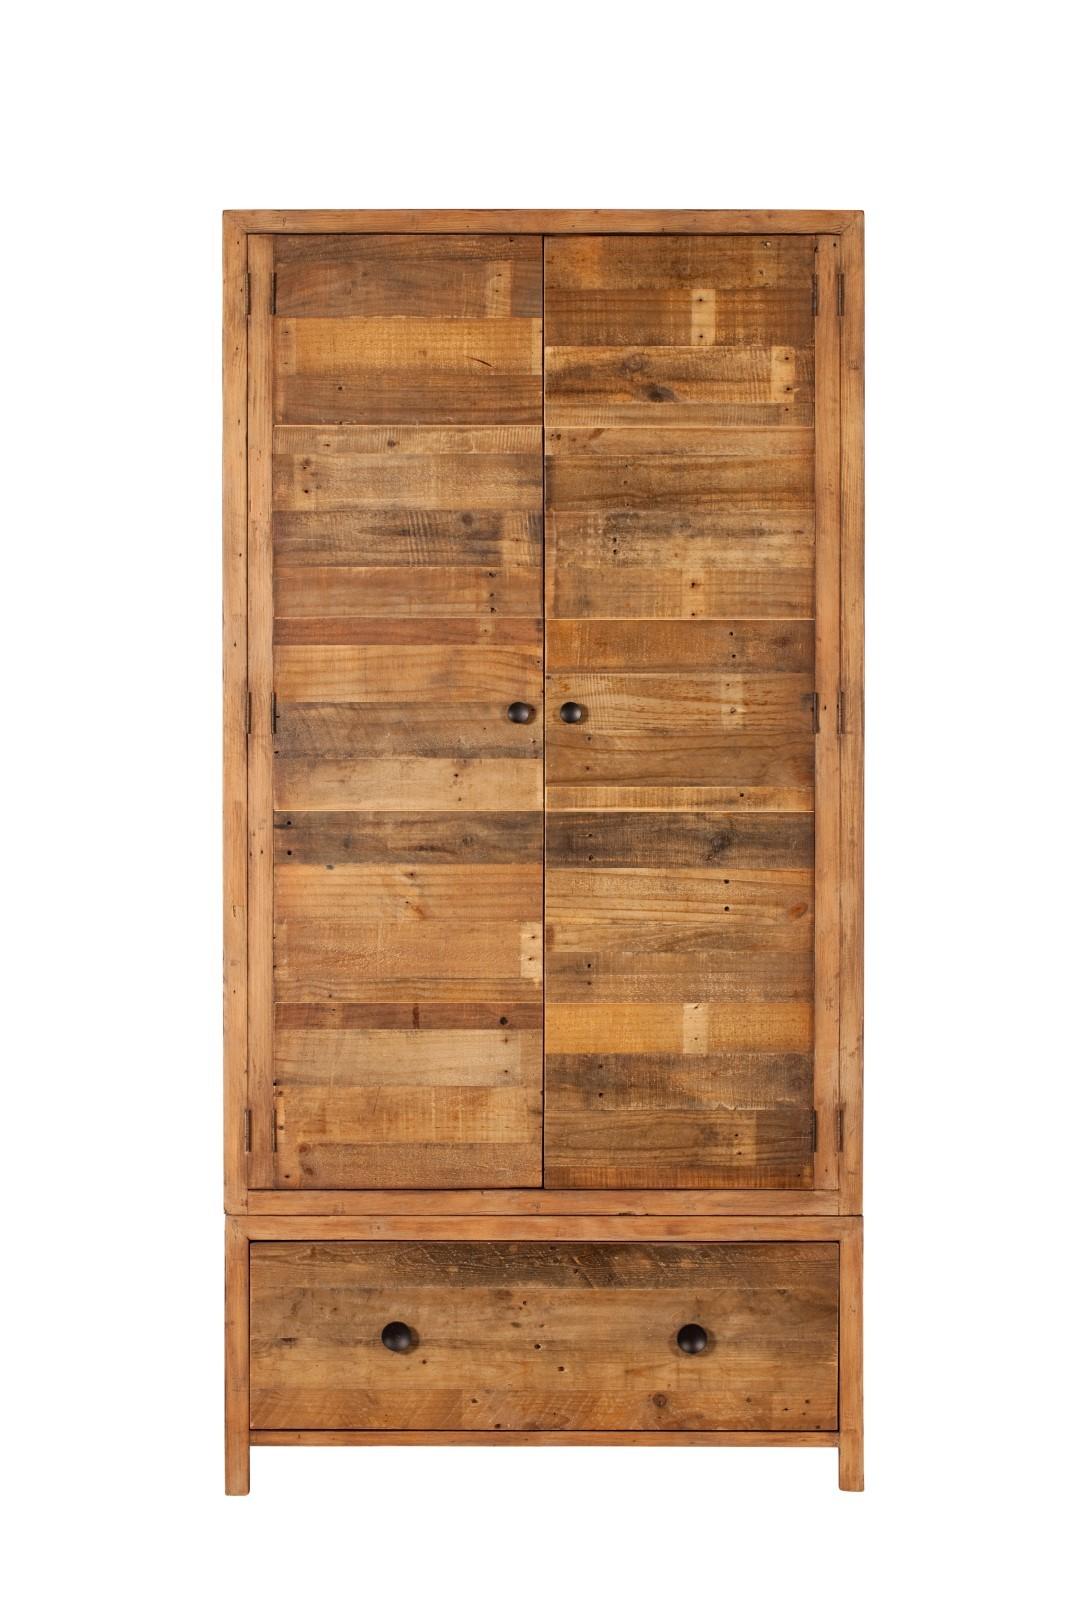 szekr s r feny fel tajt wood fa ny wardrobe lettel m pin viaszolt k solid t